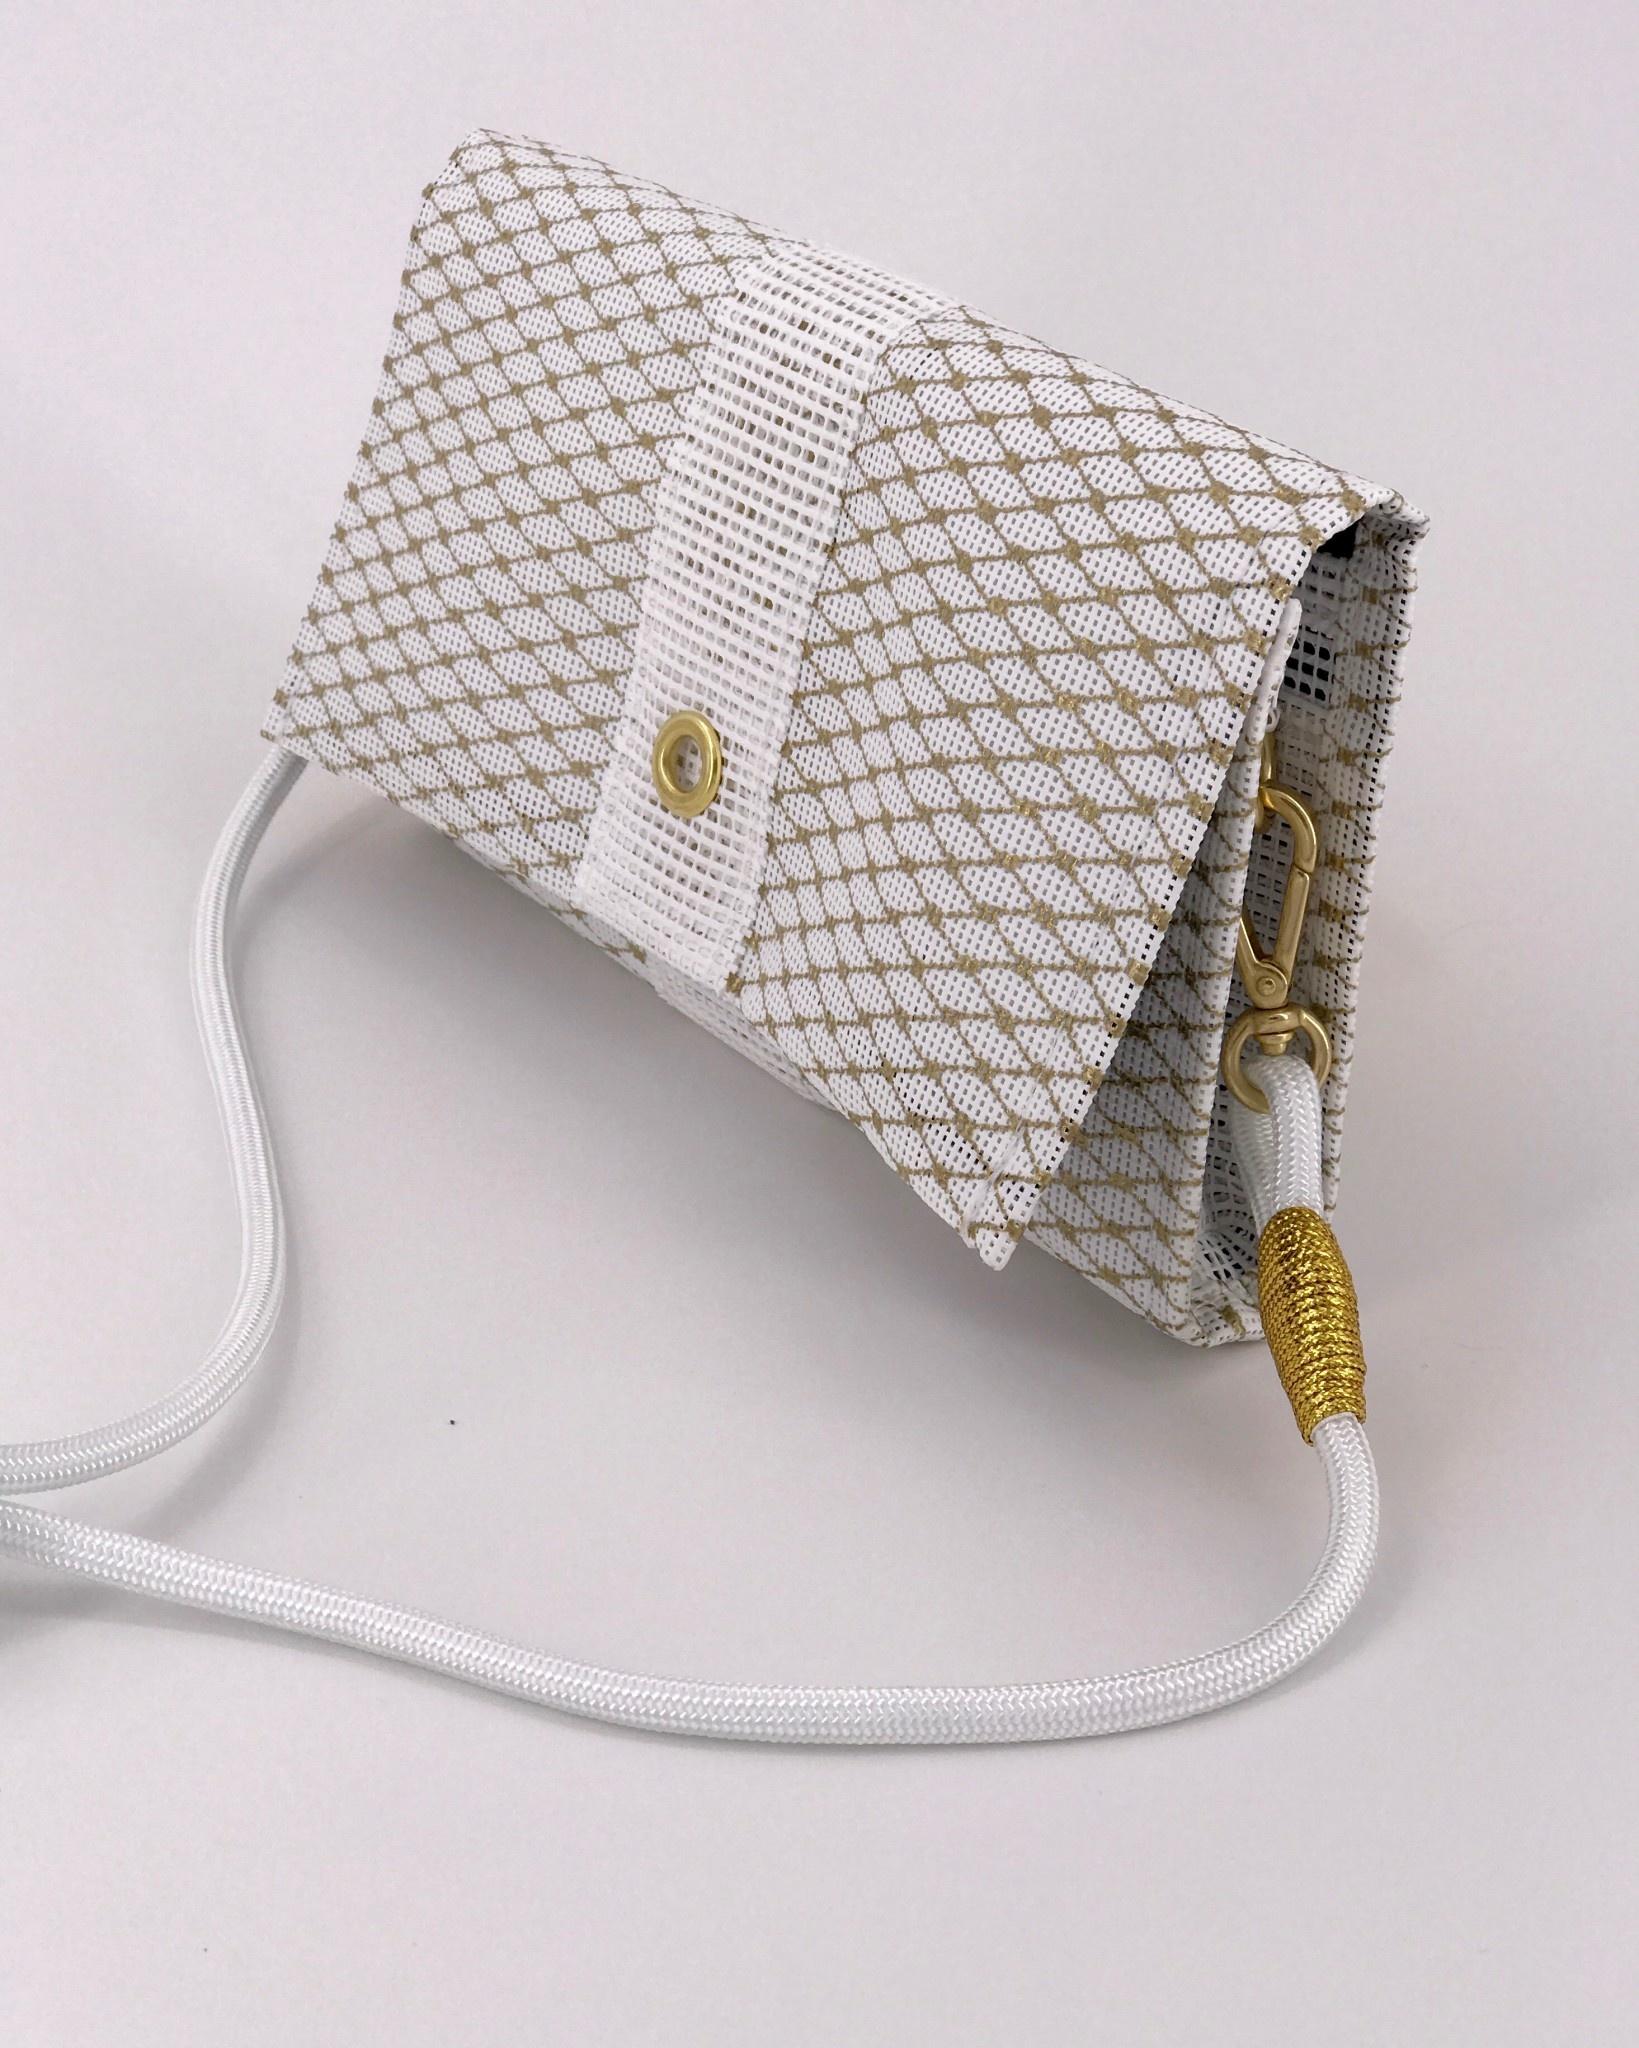 Alaina Marie ® Mini Gold Metallic & White Crossbody